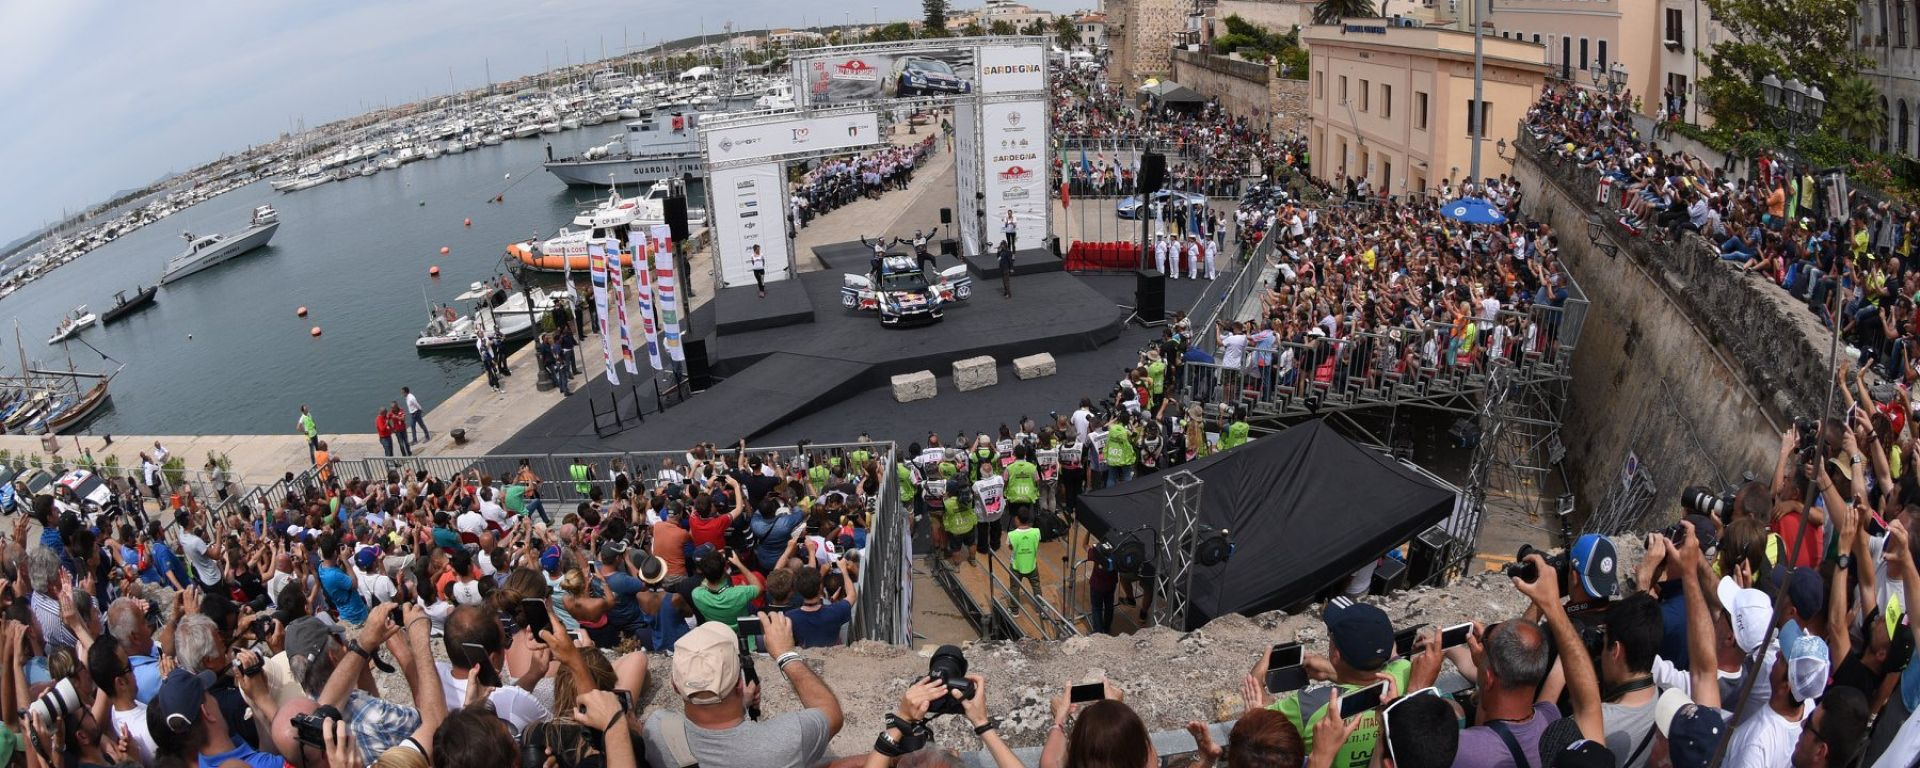 Rally Italia Sardegna - Info e risultati